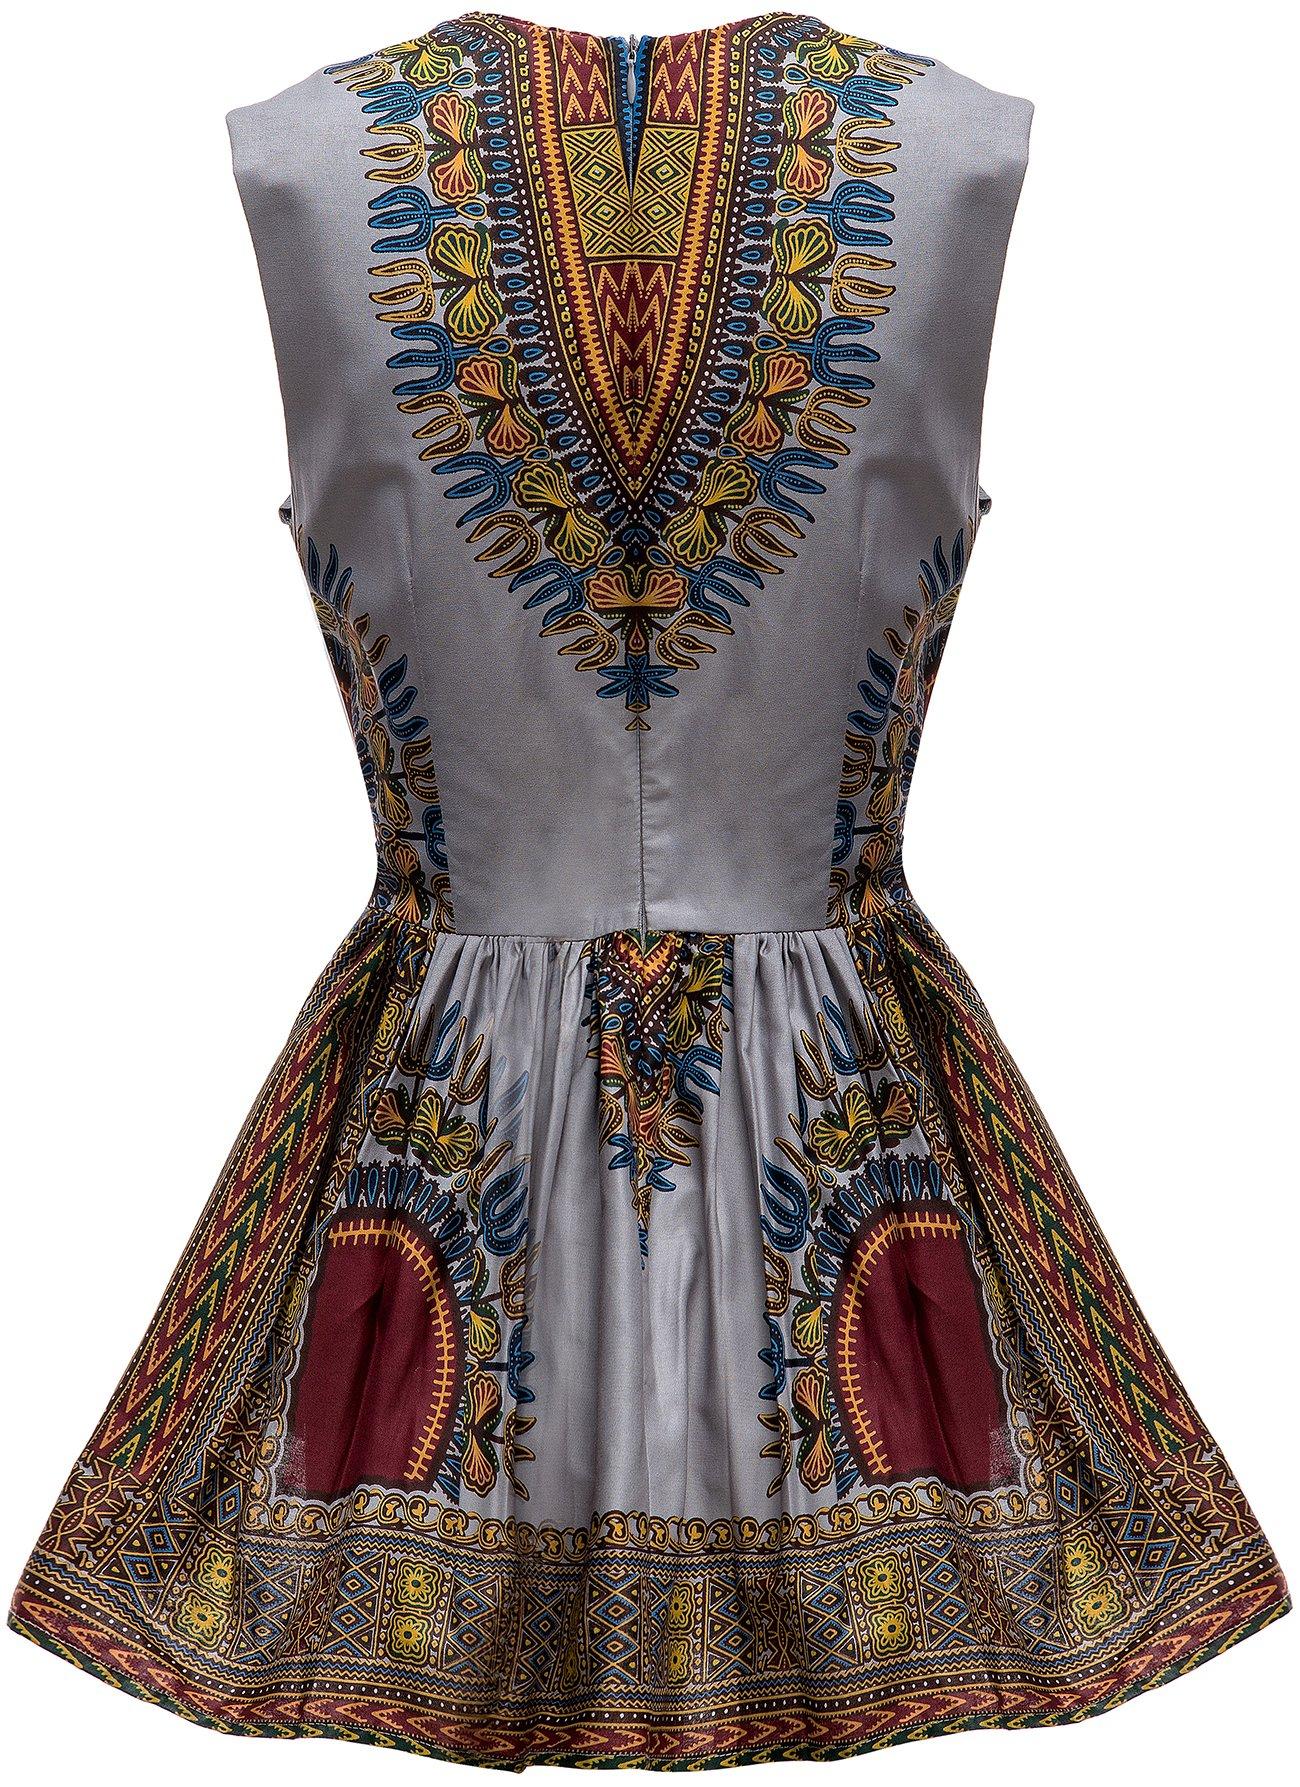 591ba51b27 Shenbolen Women African Print Shirt Dashiki Traditional Top - Best ...